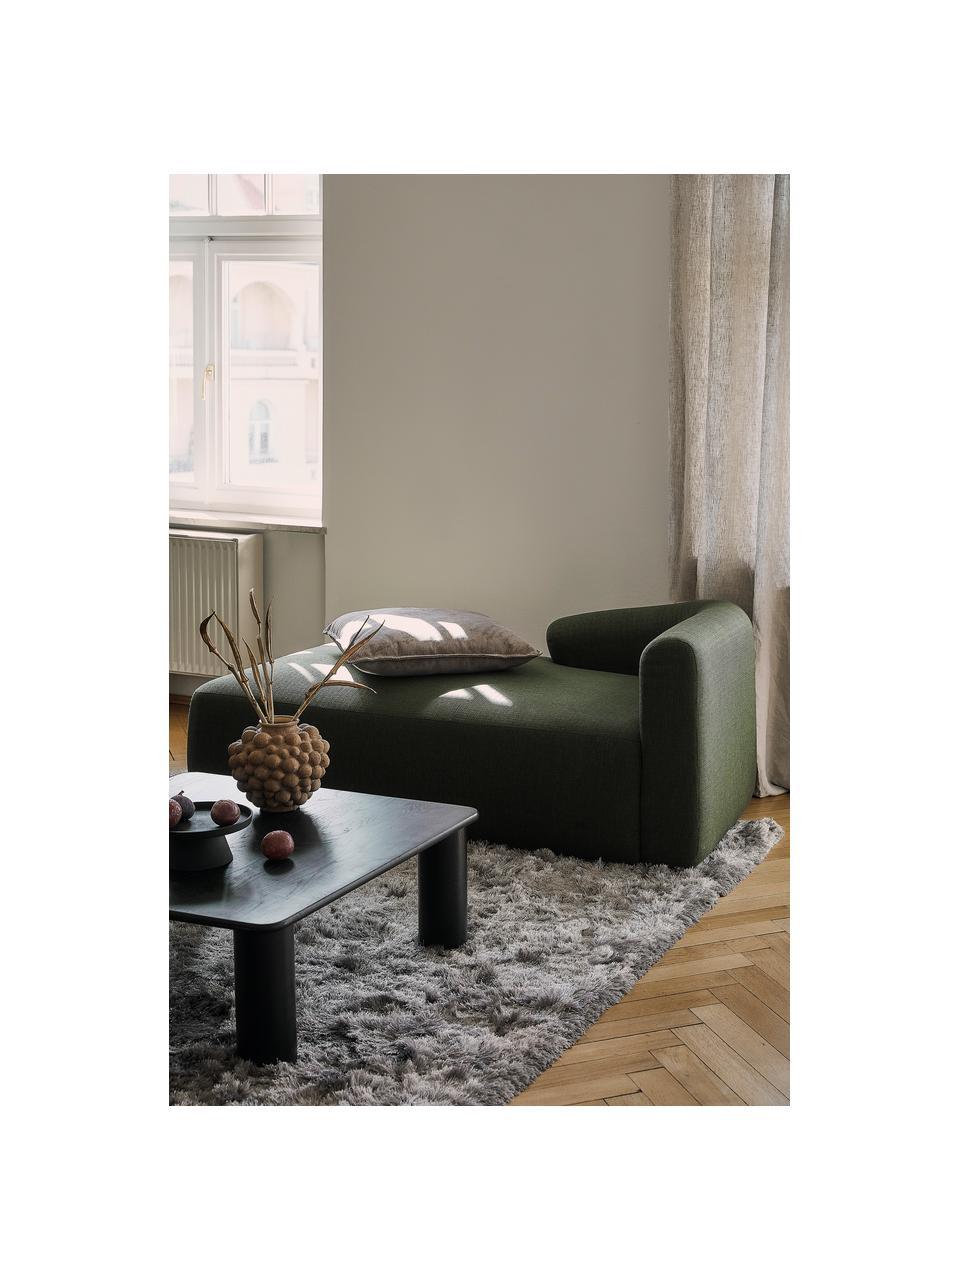 Modulaire hoekbank Sofia, groen, Bekleding: 100% polypropyleen, Frame: massief grenenhout, spaan, Poten: kunststof, Donkergroen, B 278 x D 174 cm